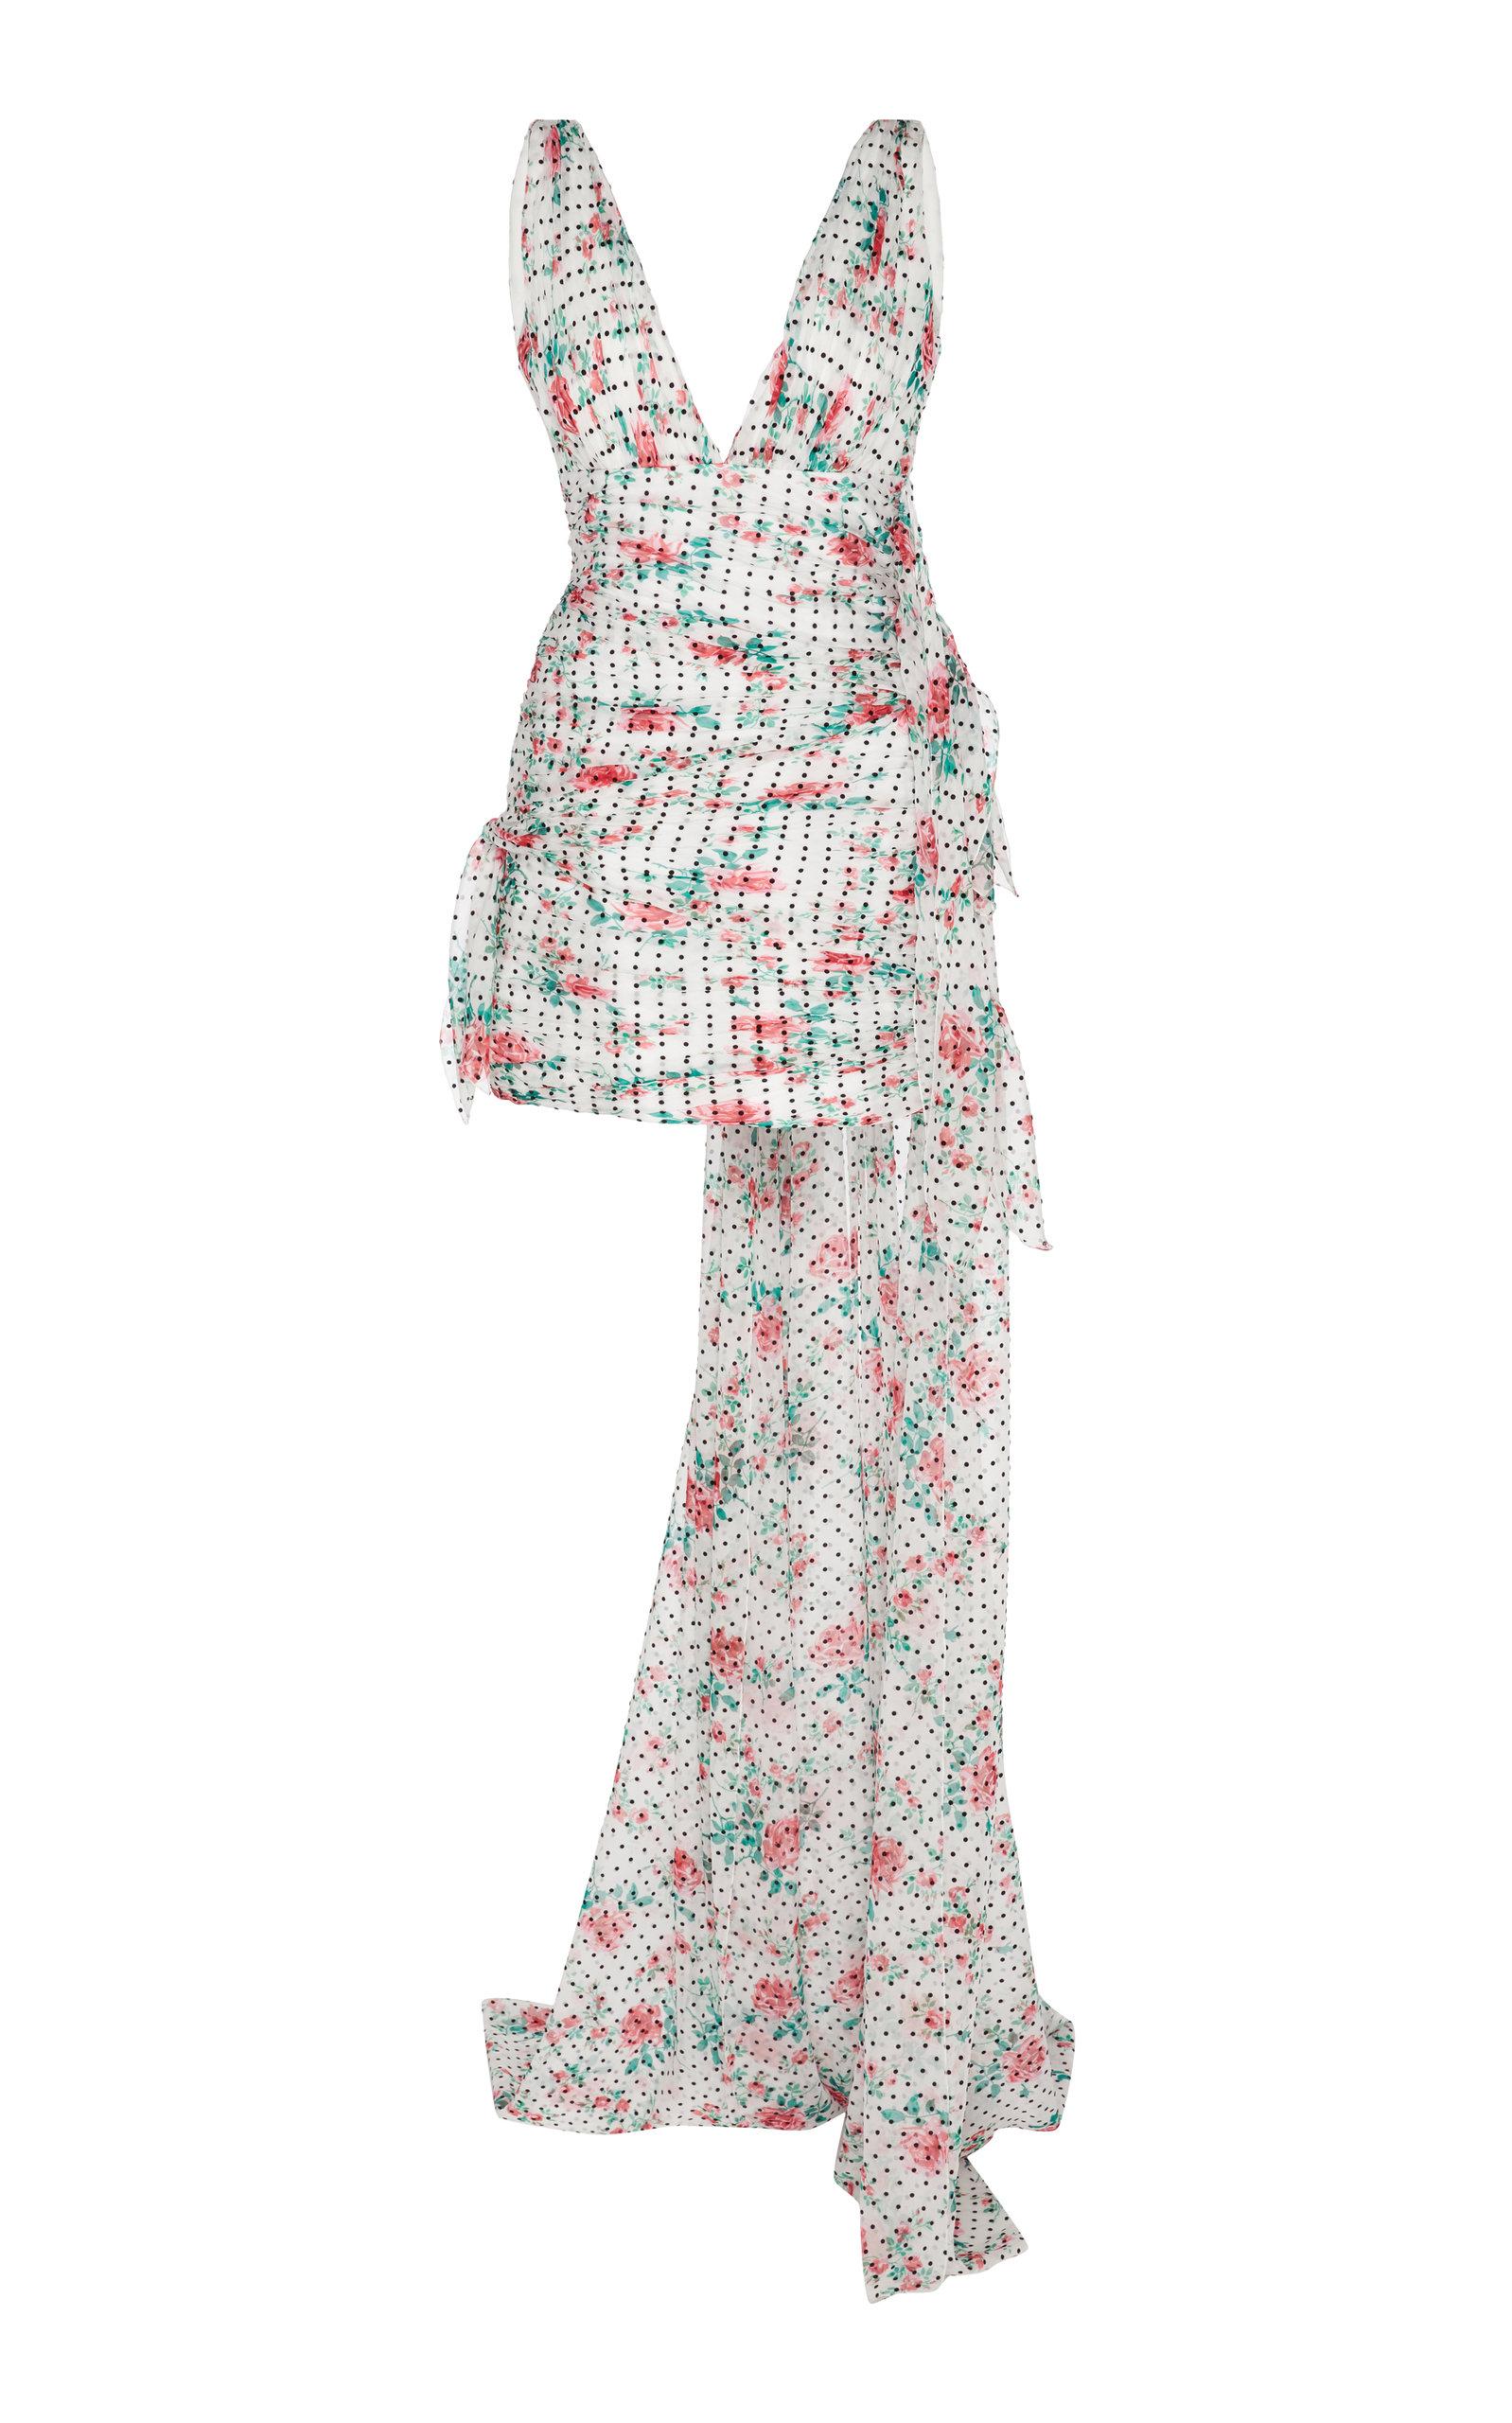 Buy Philosophy di Lorenzo Serafini Patterned Chiffon Gown online, shop Philosophy di Lorenzo Serafini at the best price